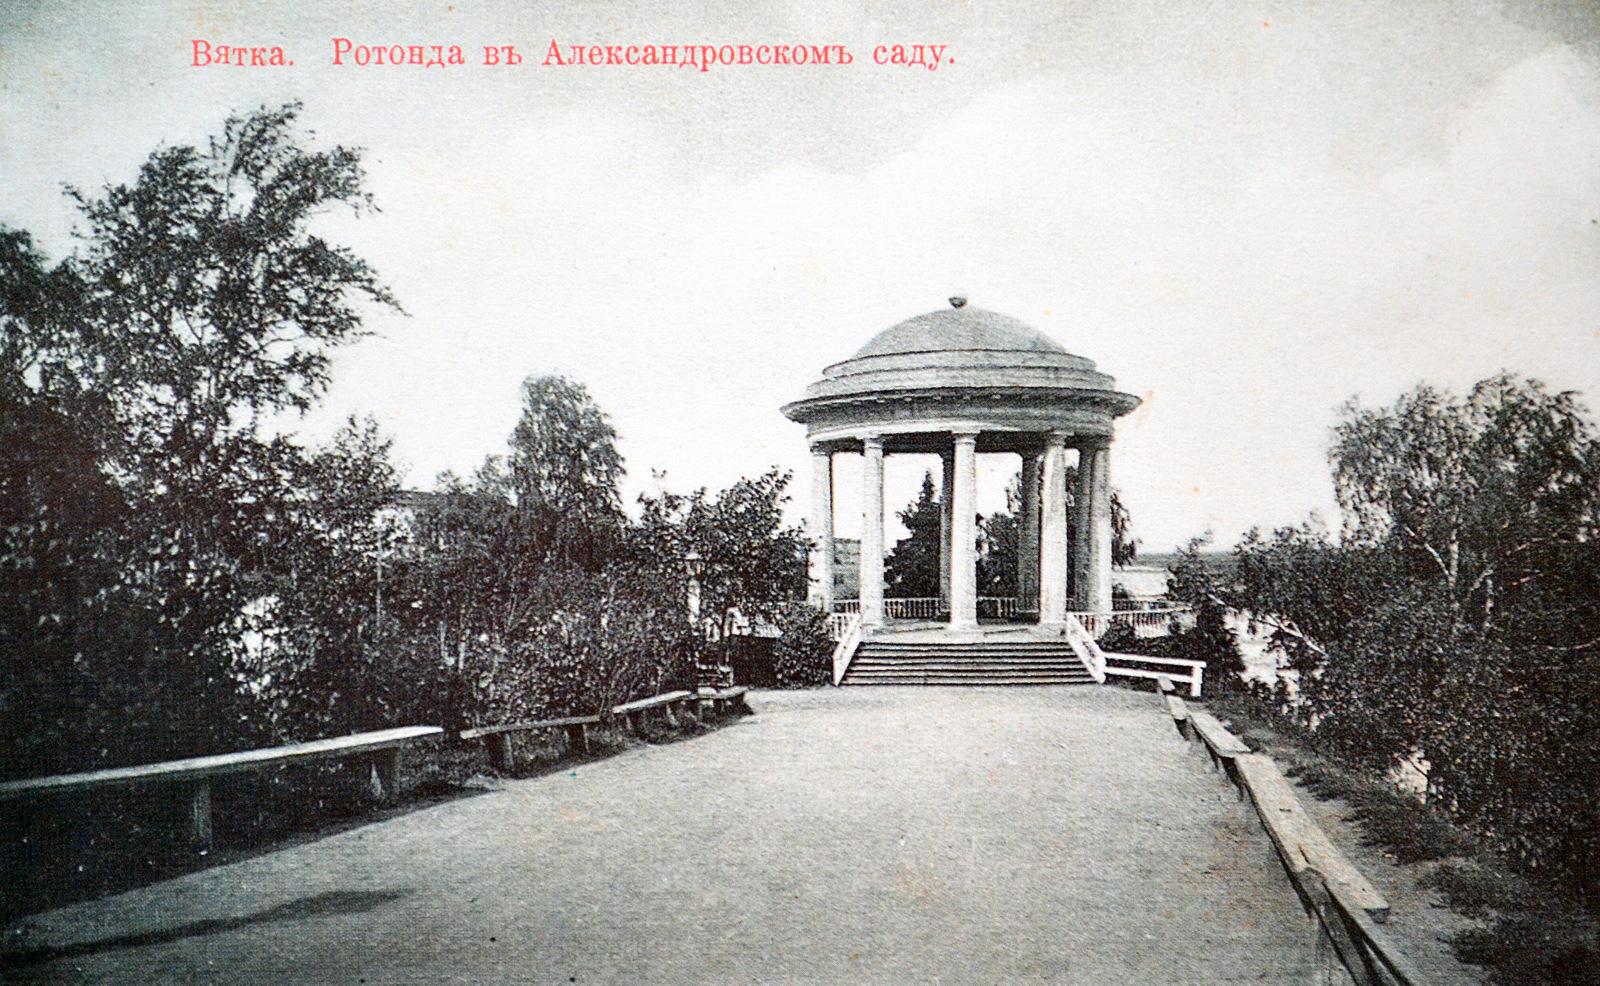 Александровском сад. Ротонда